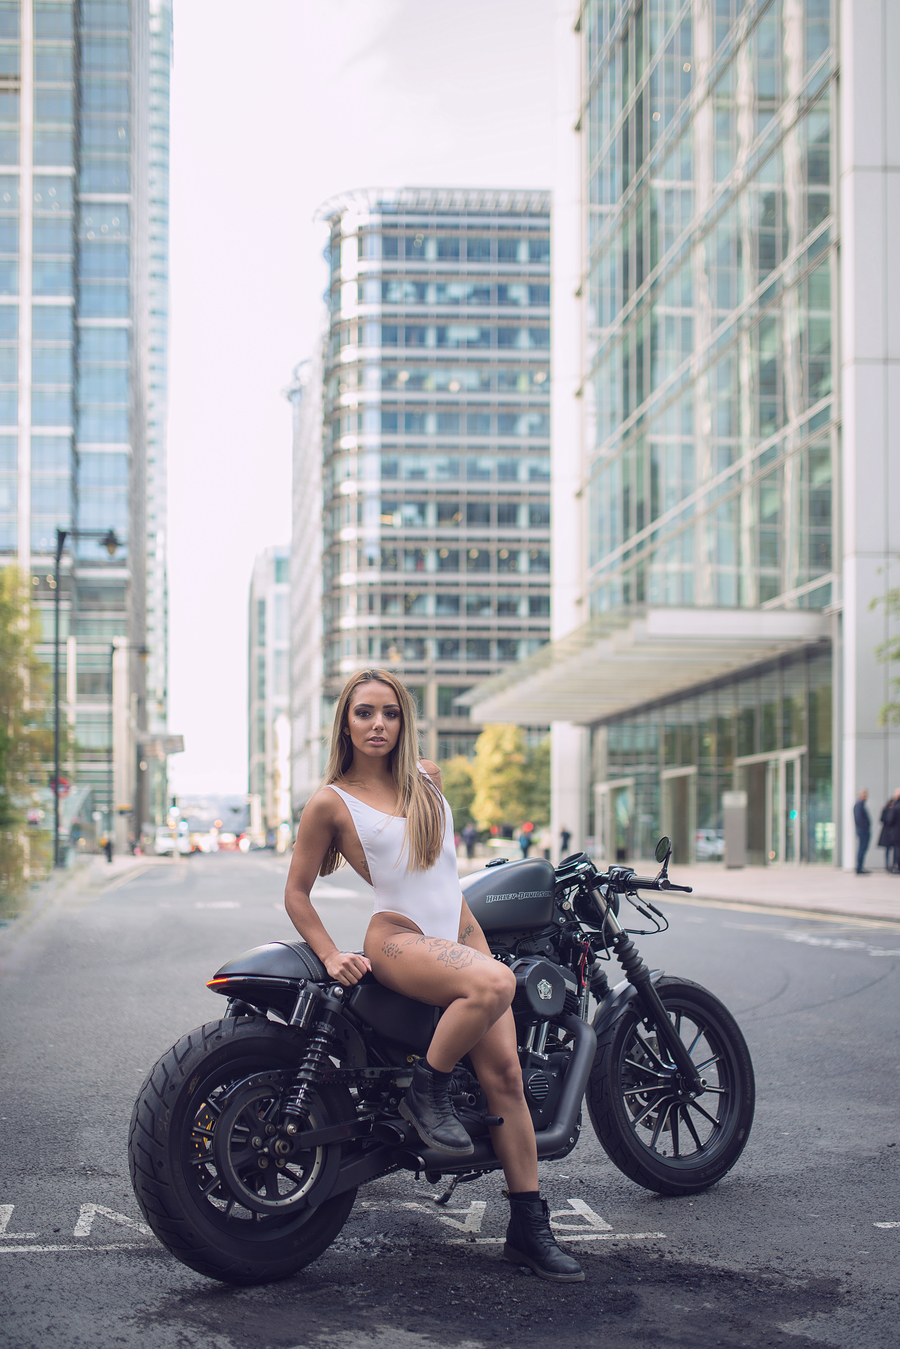 Model Bellita / Uploaded 17th January 2018 @ 10:04 AM